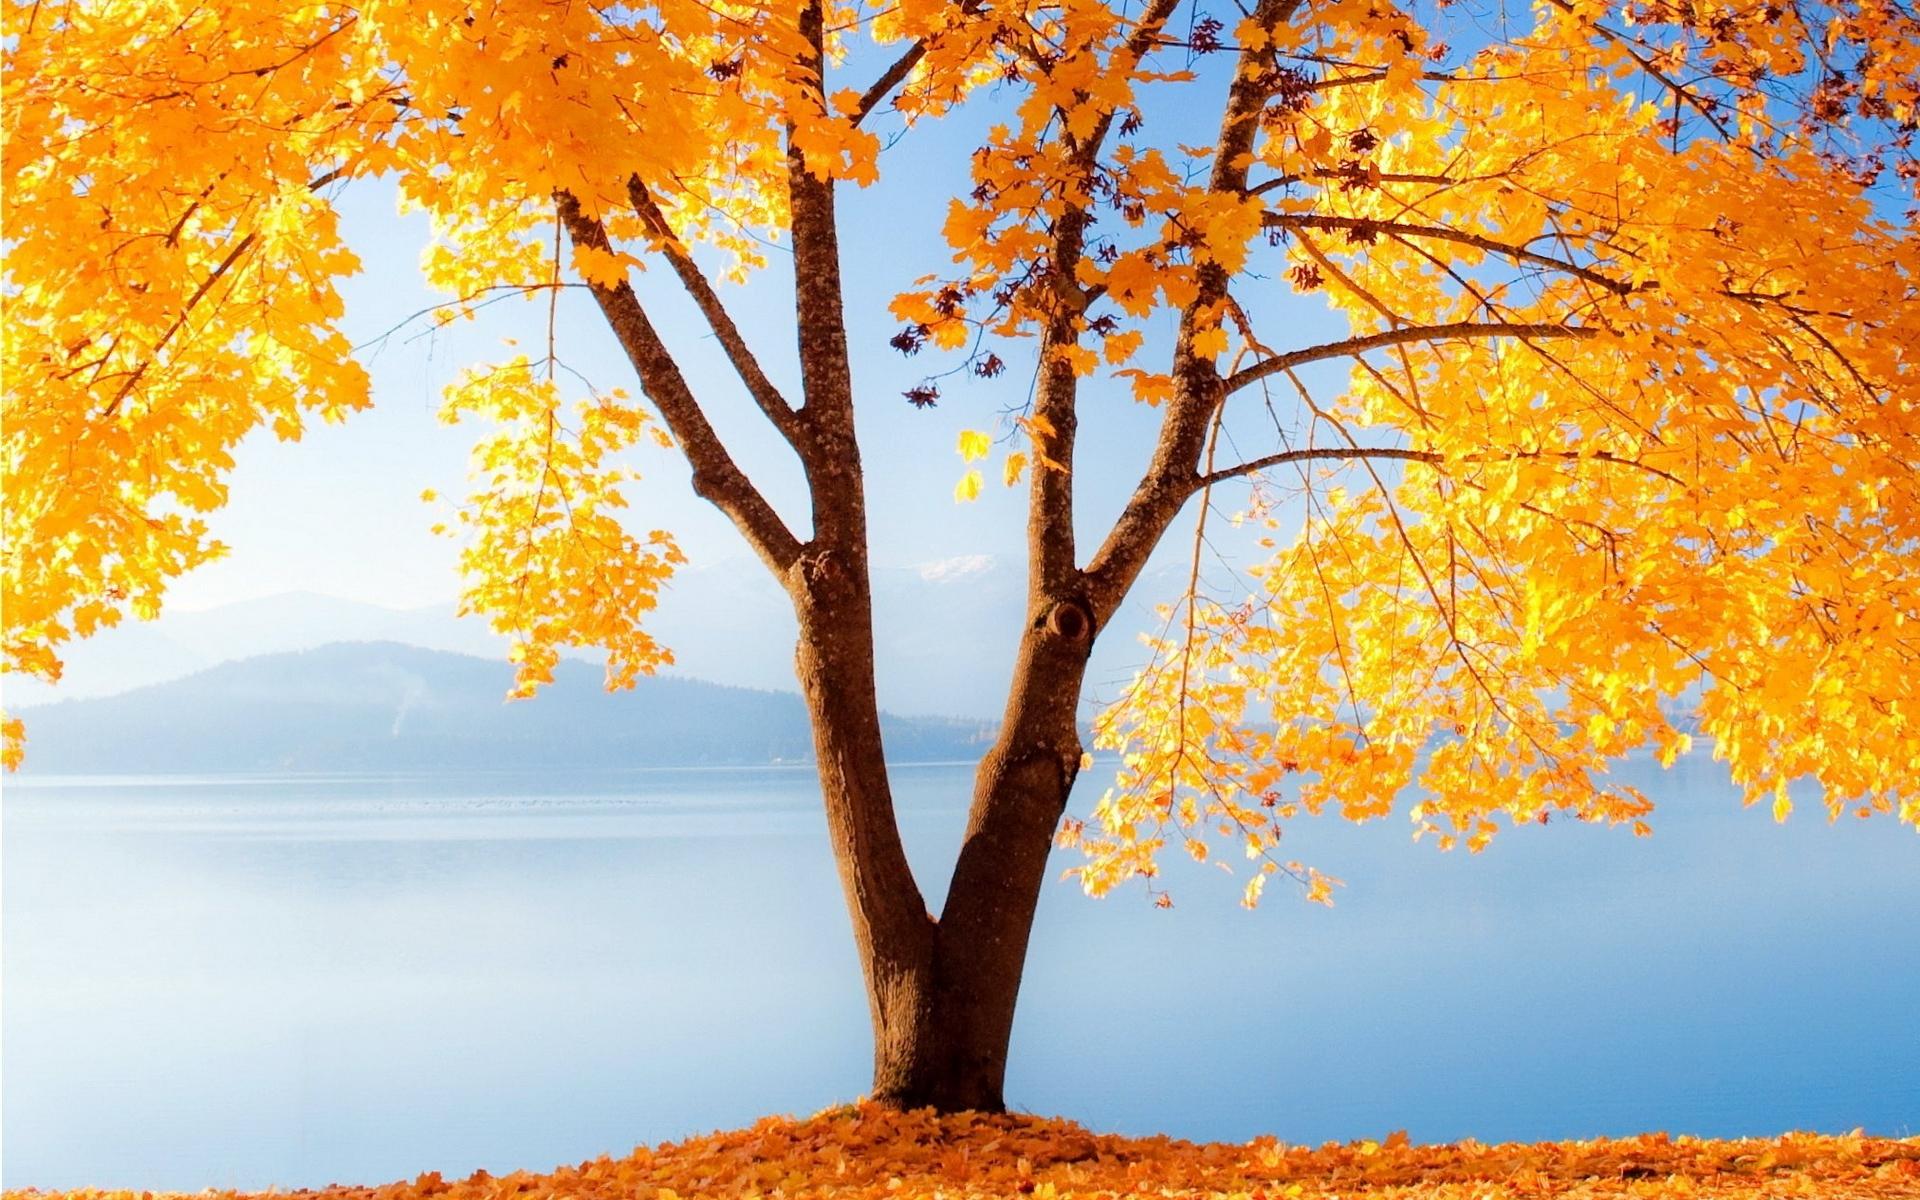 fall desktop wallpaper 15899